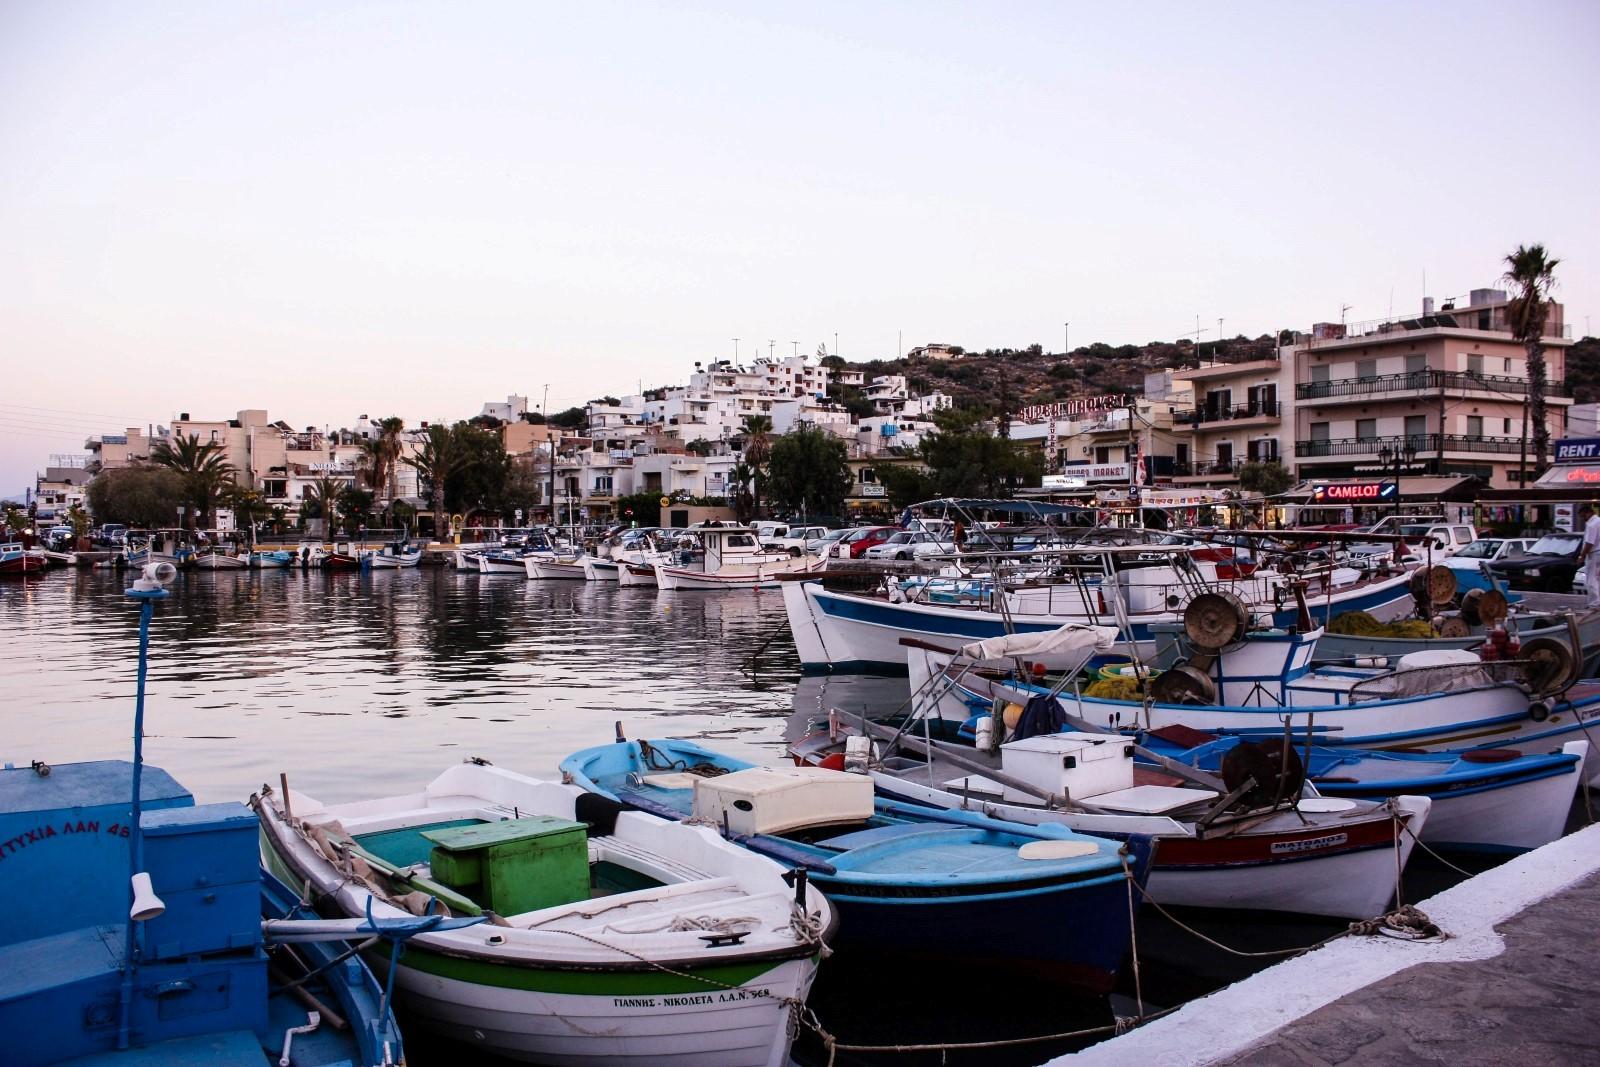 Travel Guide For Island Crete Greece 10 Picturesque Harbours Of Crete